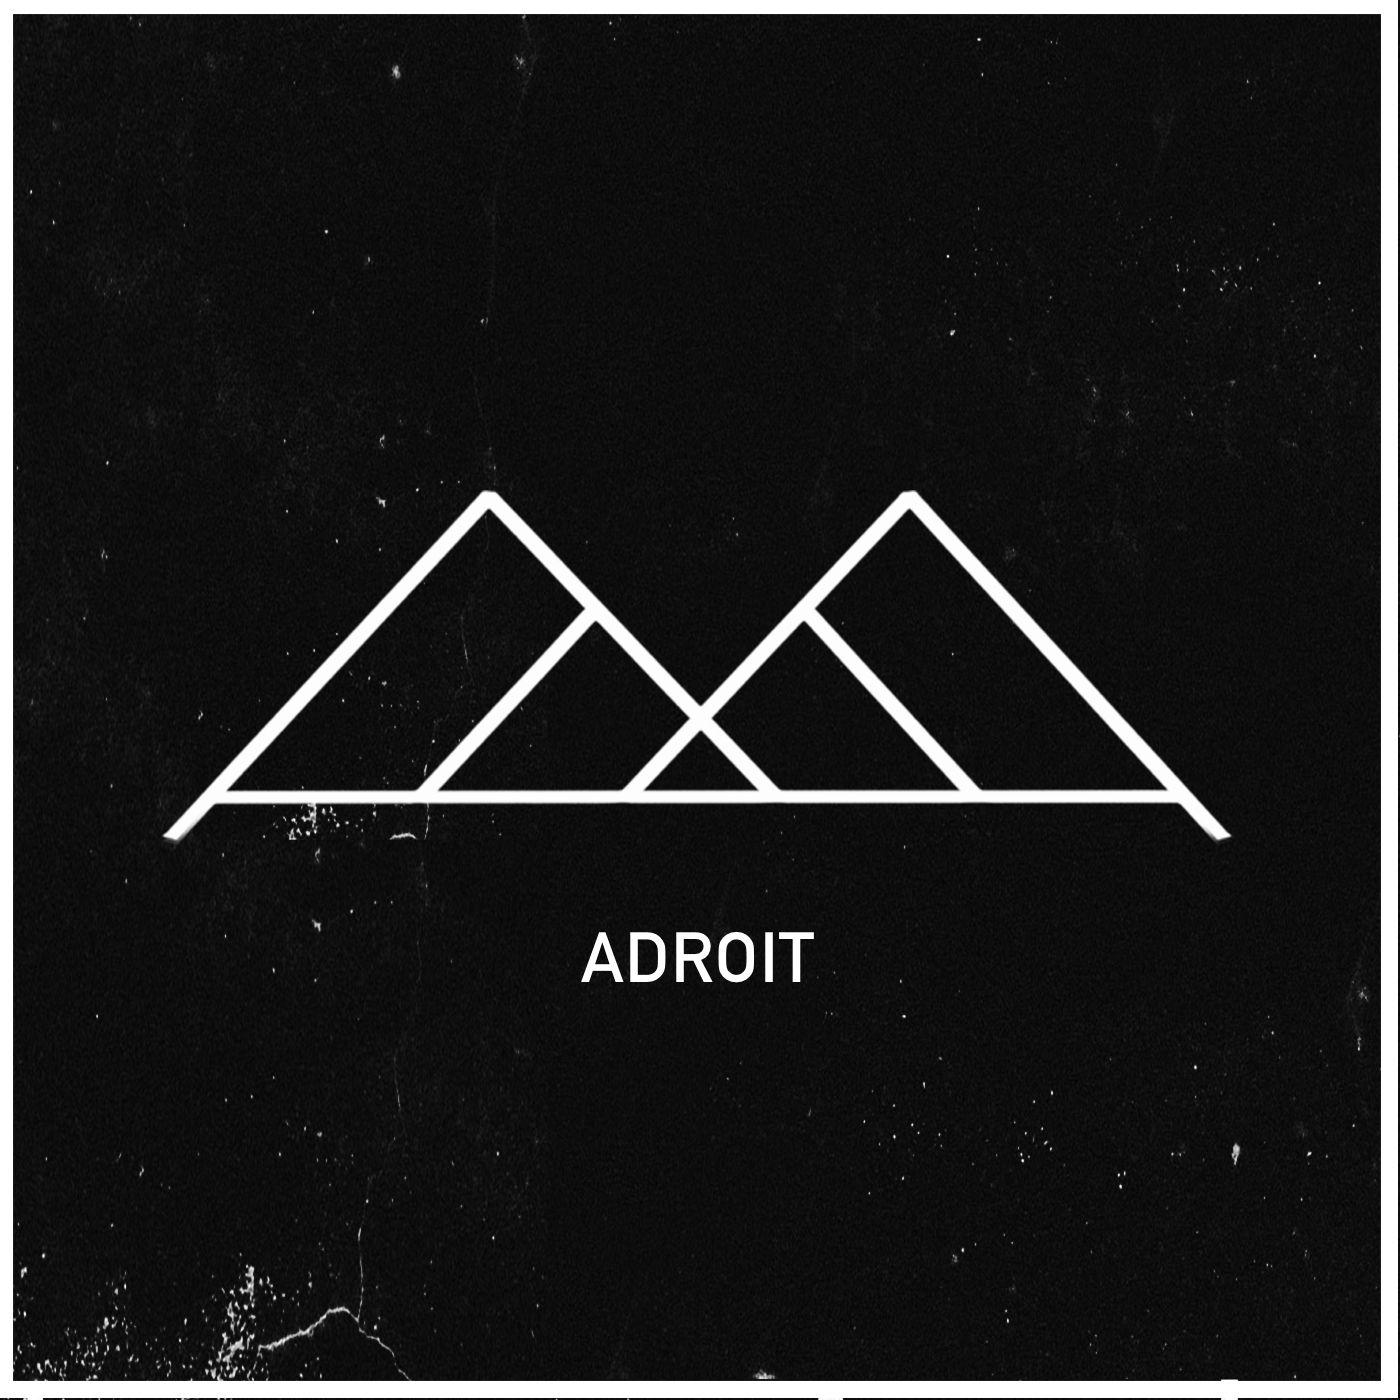 adroit_logo_pr.jpg